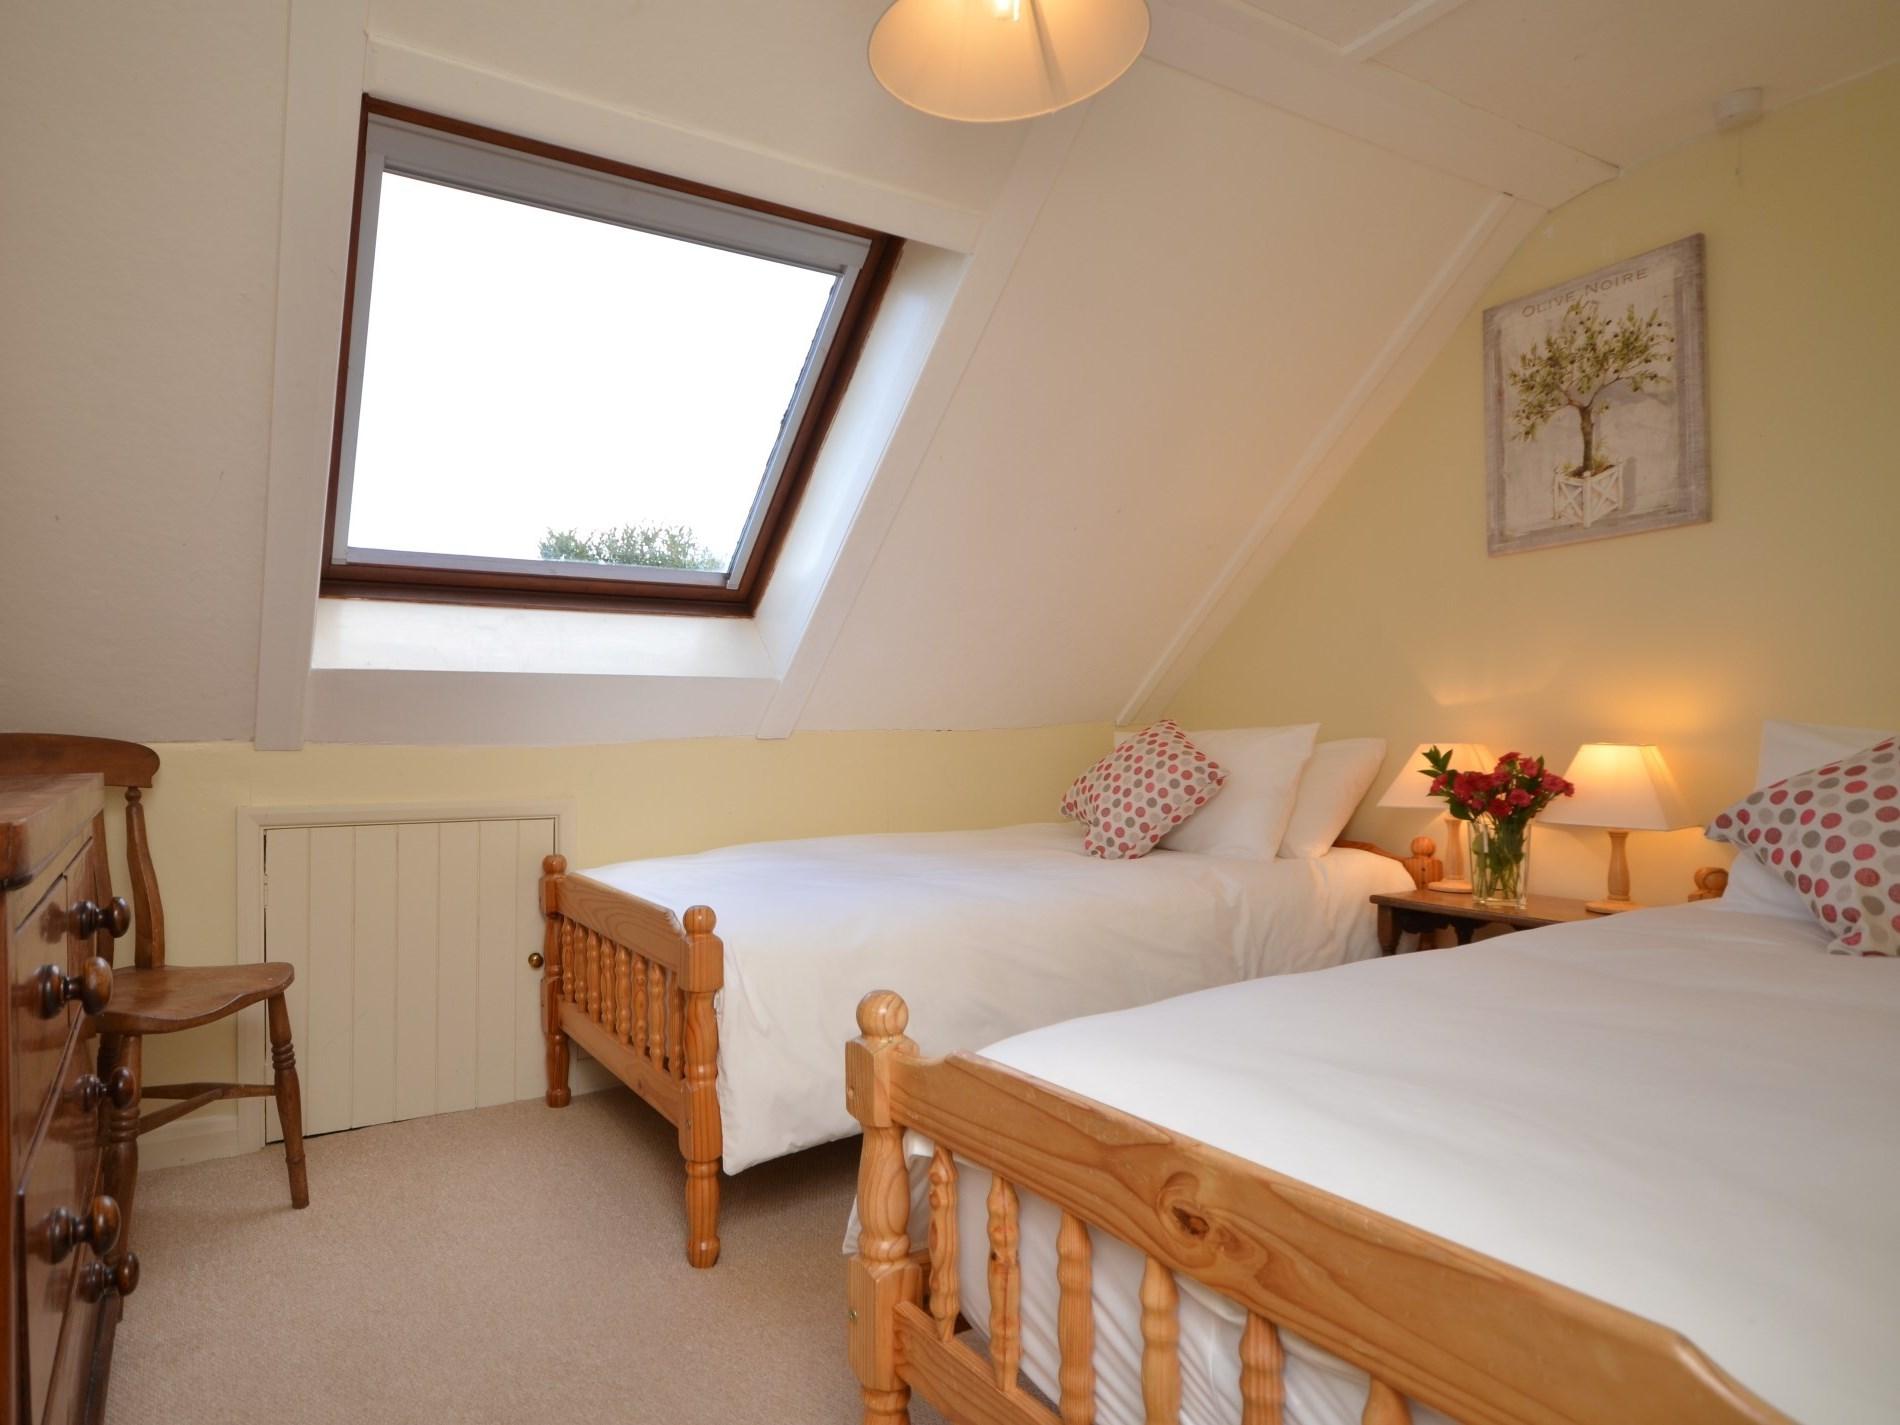 4 Bedroom Cottage in Honiton, Devon